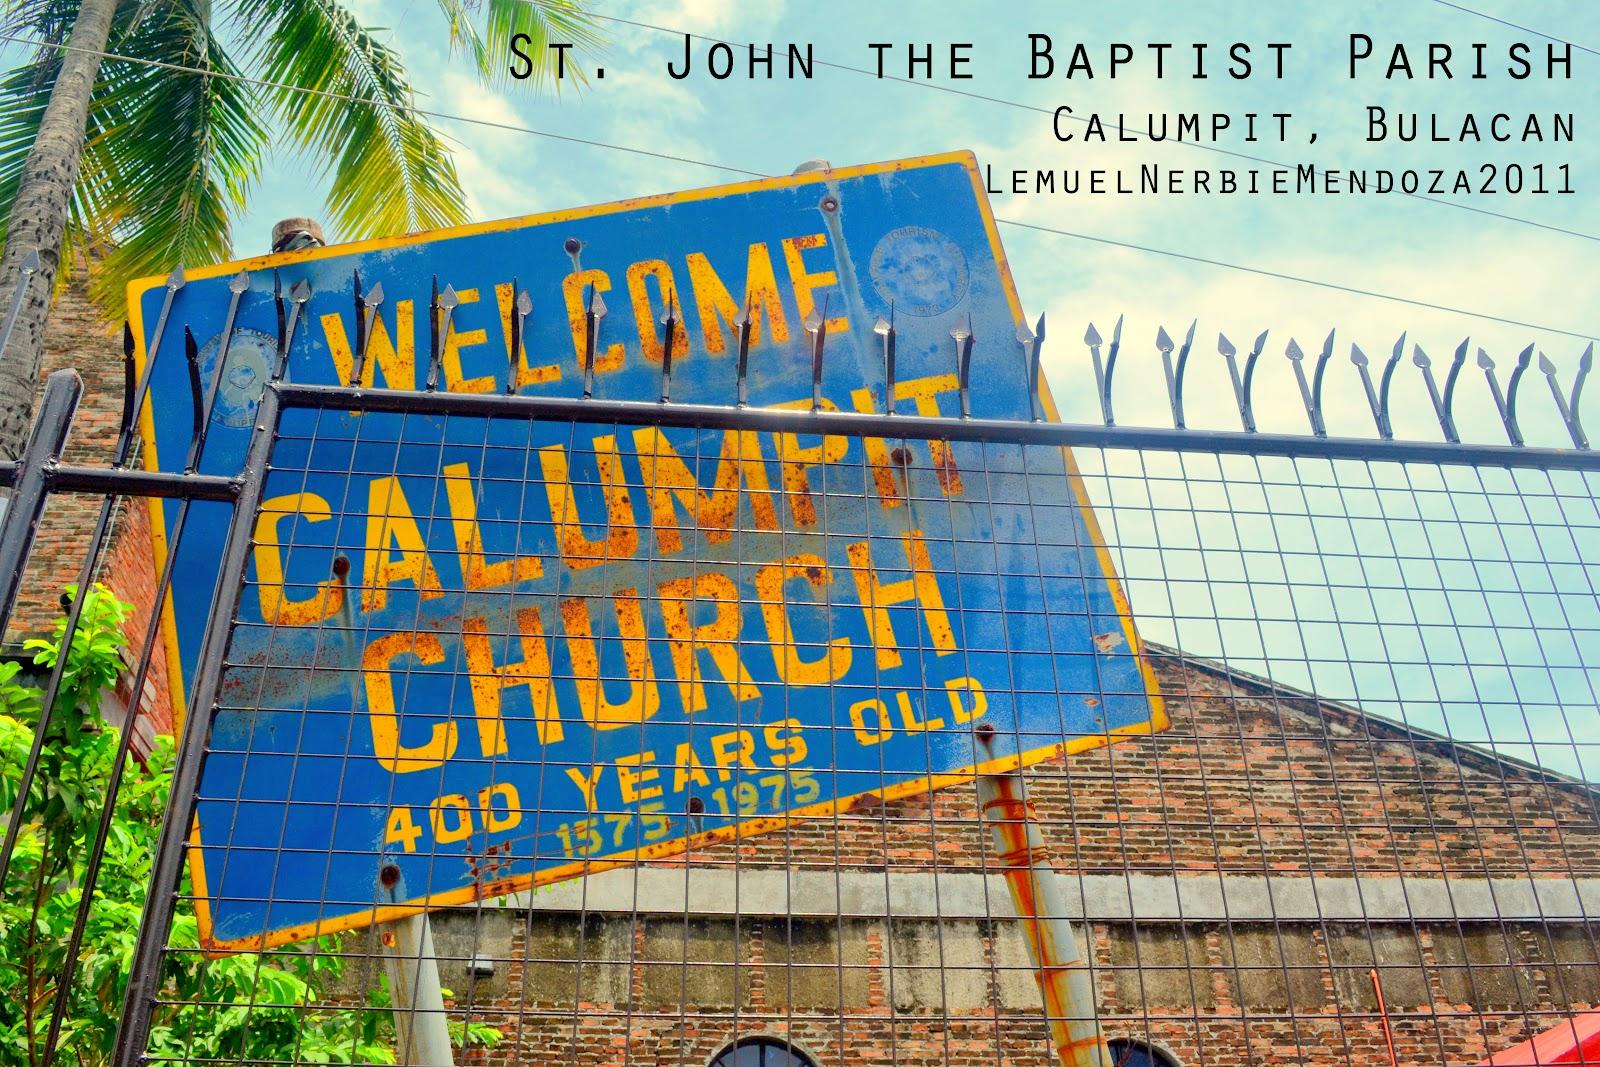 Calumpit Philippines  city images : Iglesias de las Filipinas: CALUMPIT, Bulacan: St. John the Baptist ...